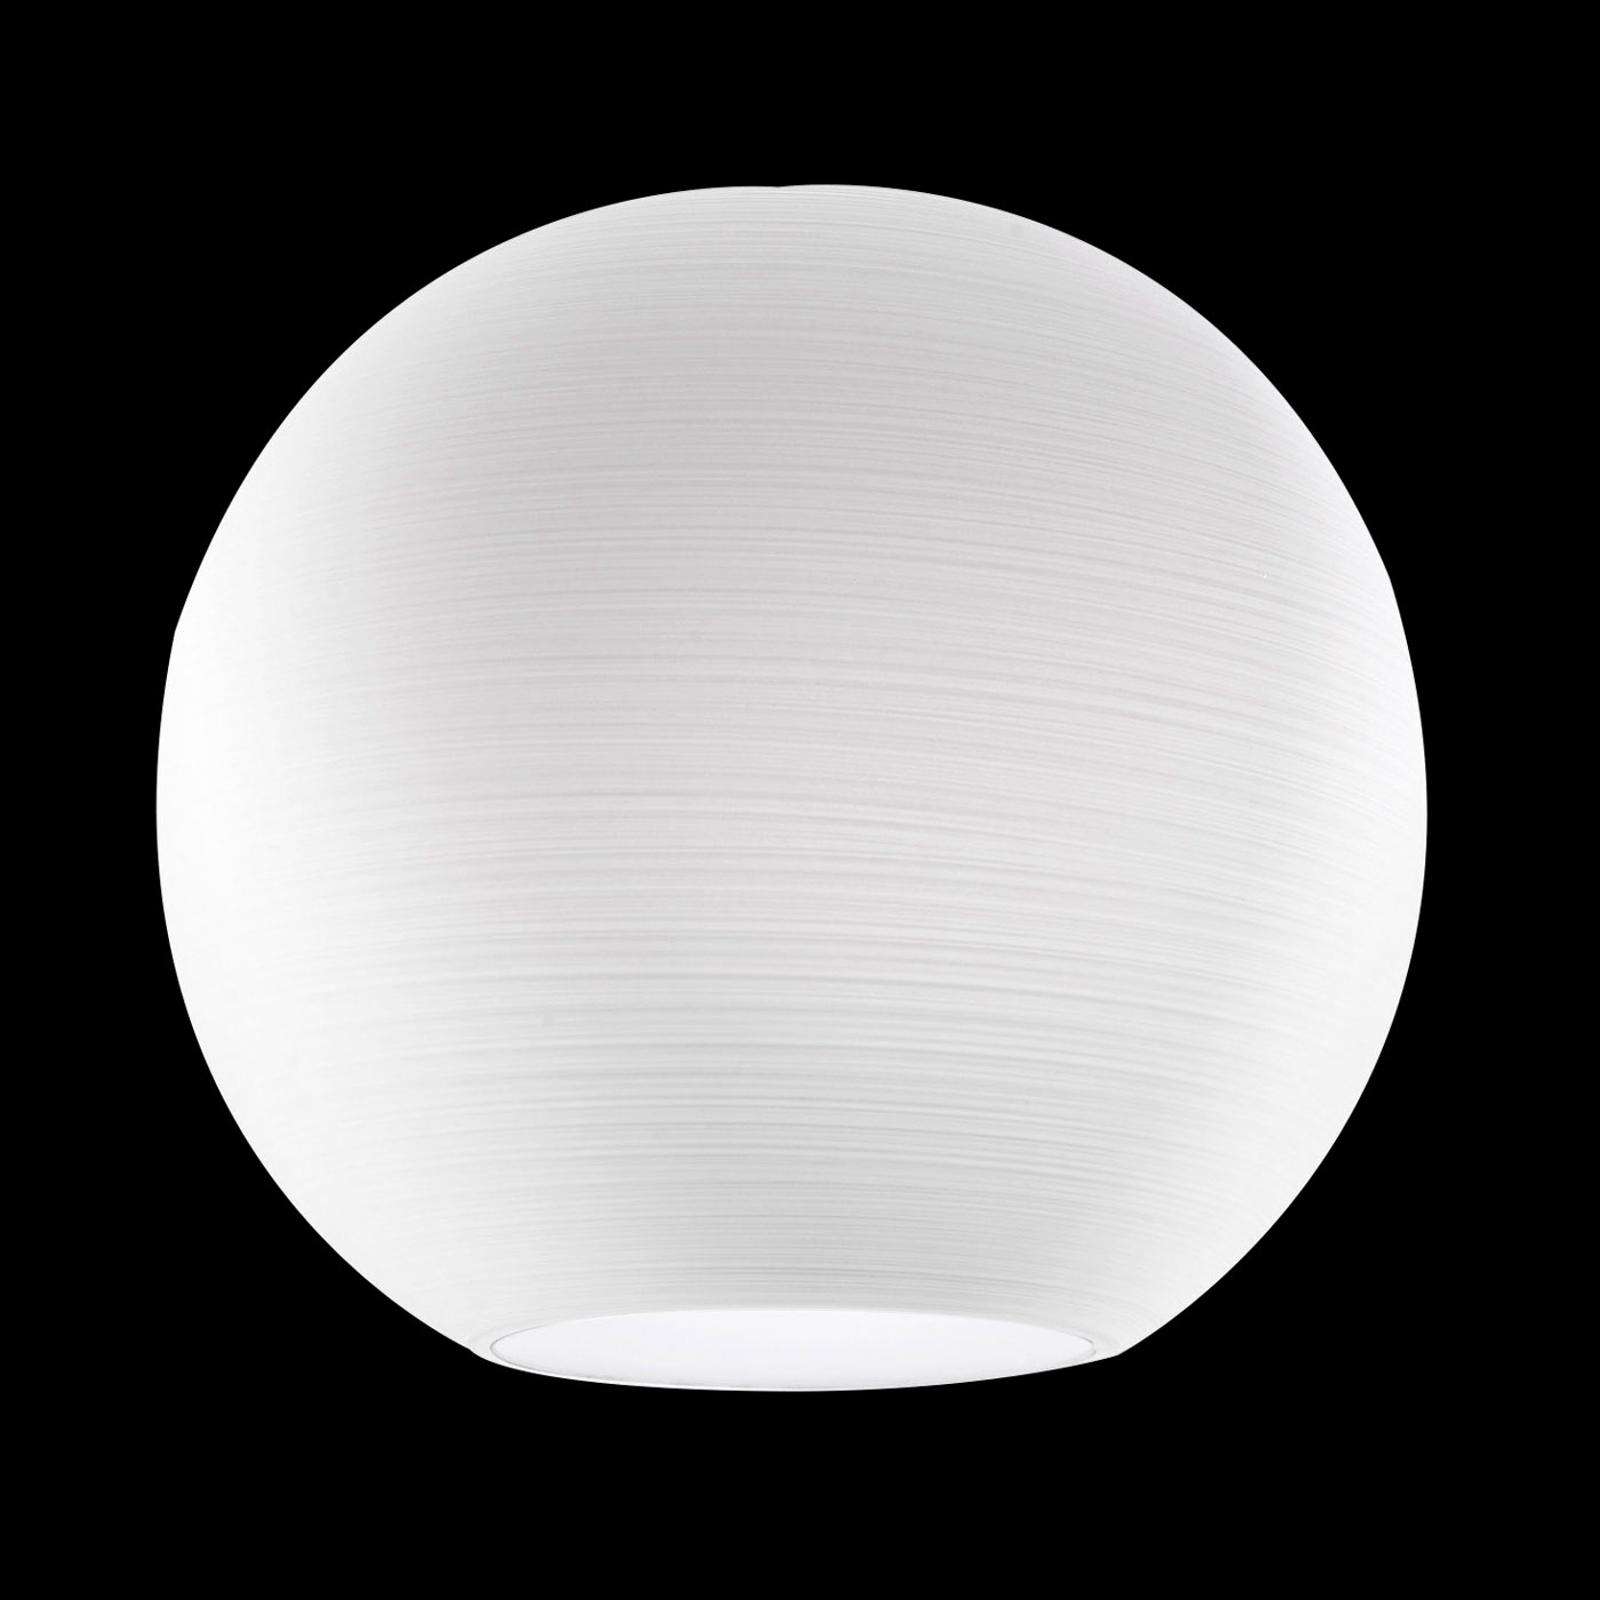 Schirm 31370 opal gewischt HV-Track 4 Pendel 54891